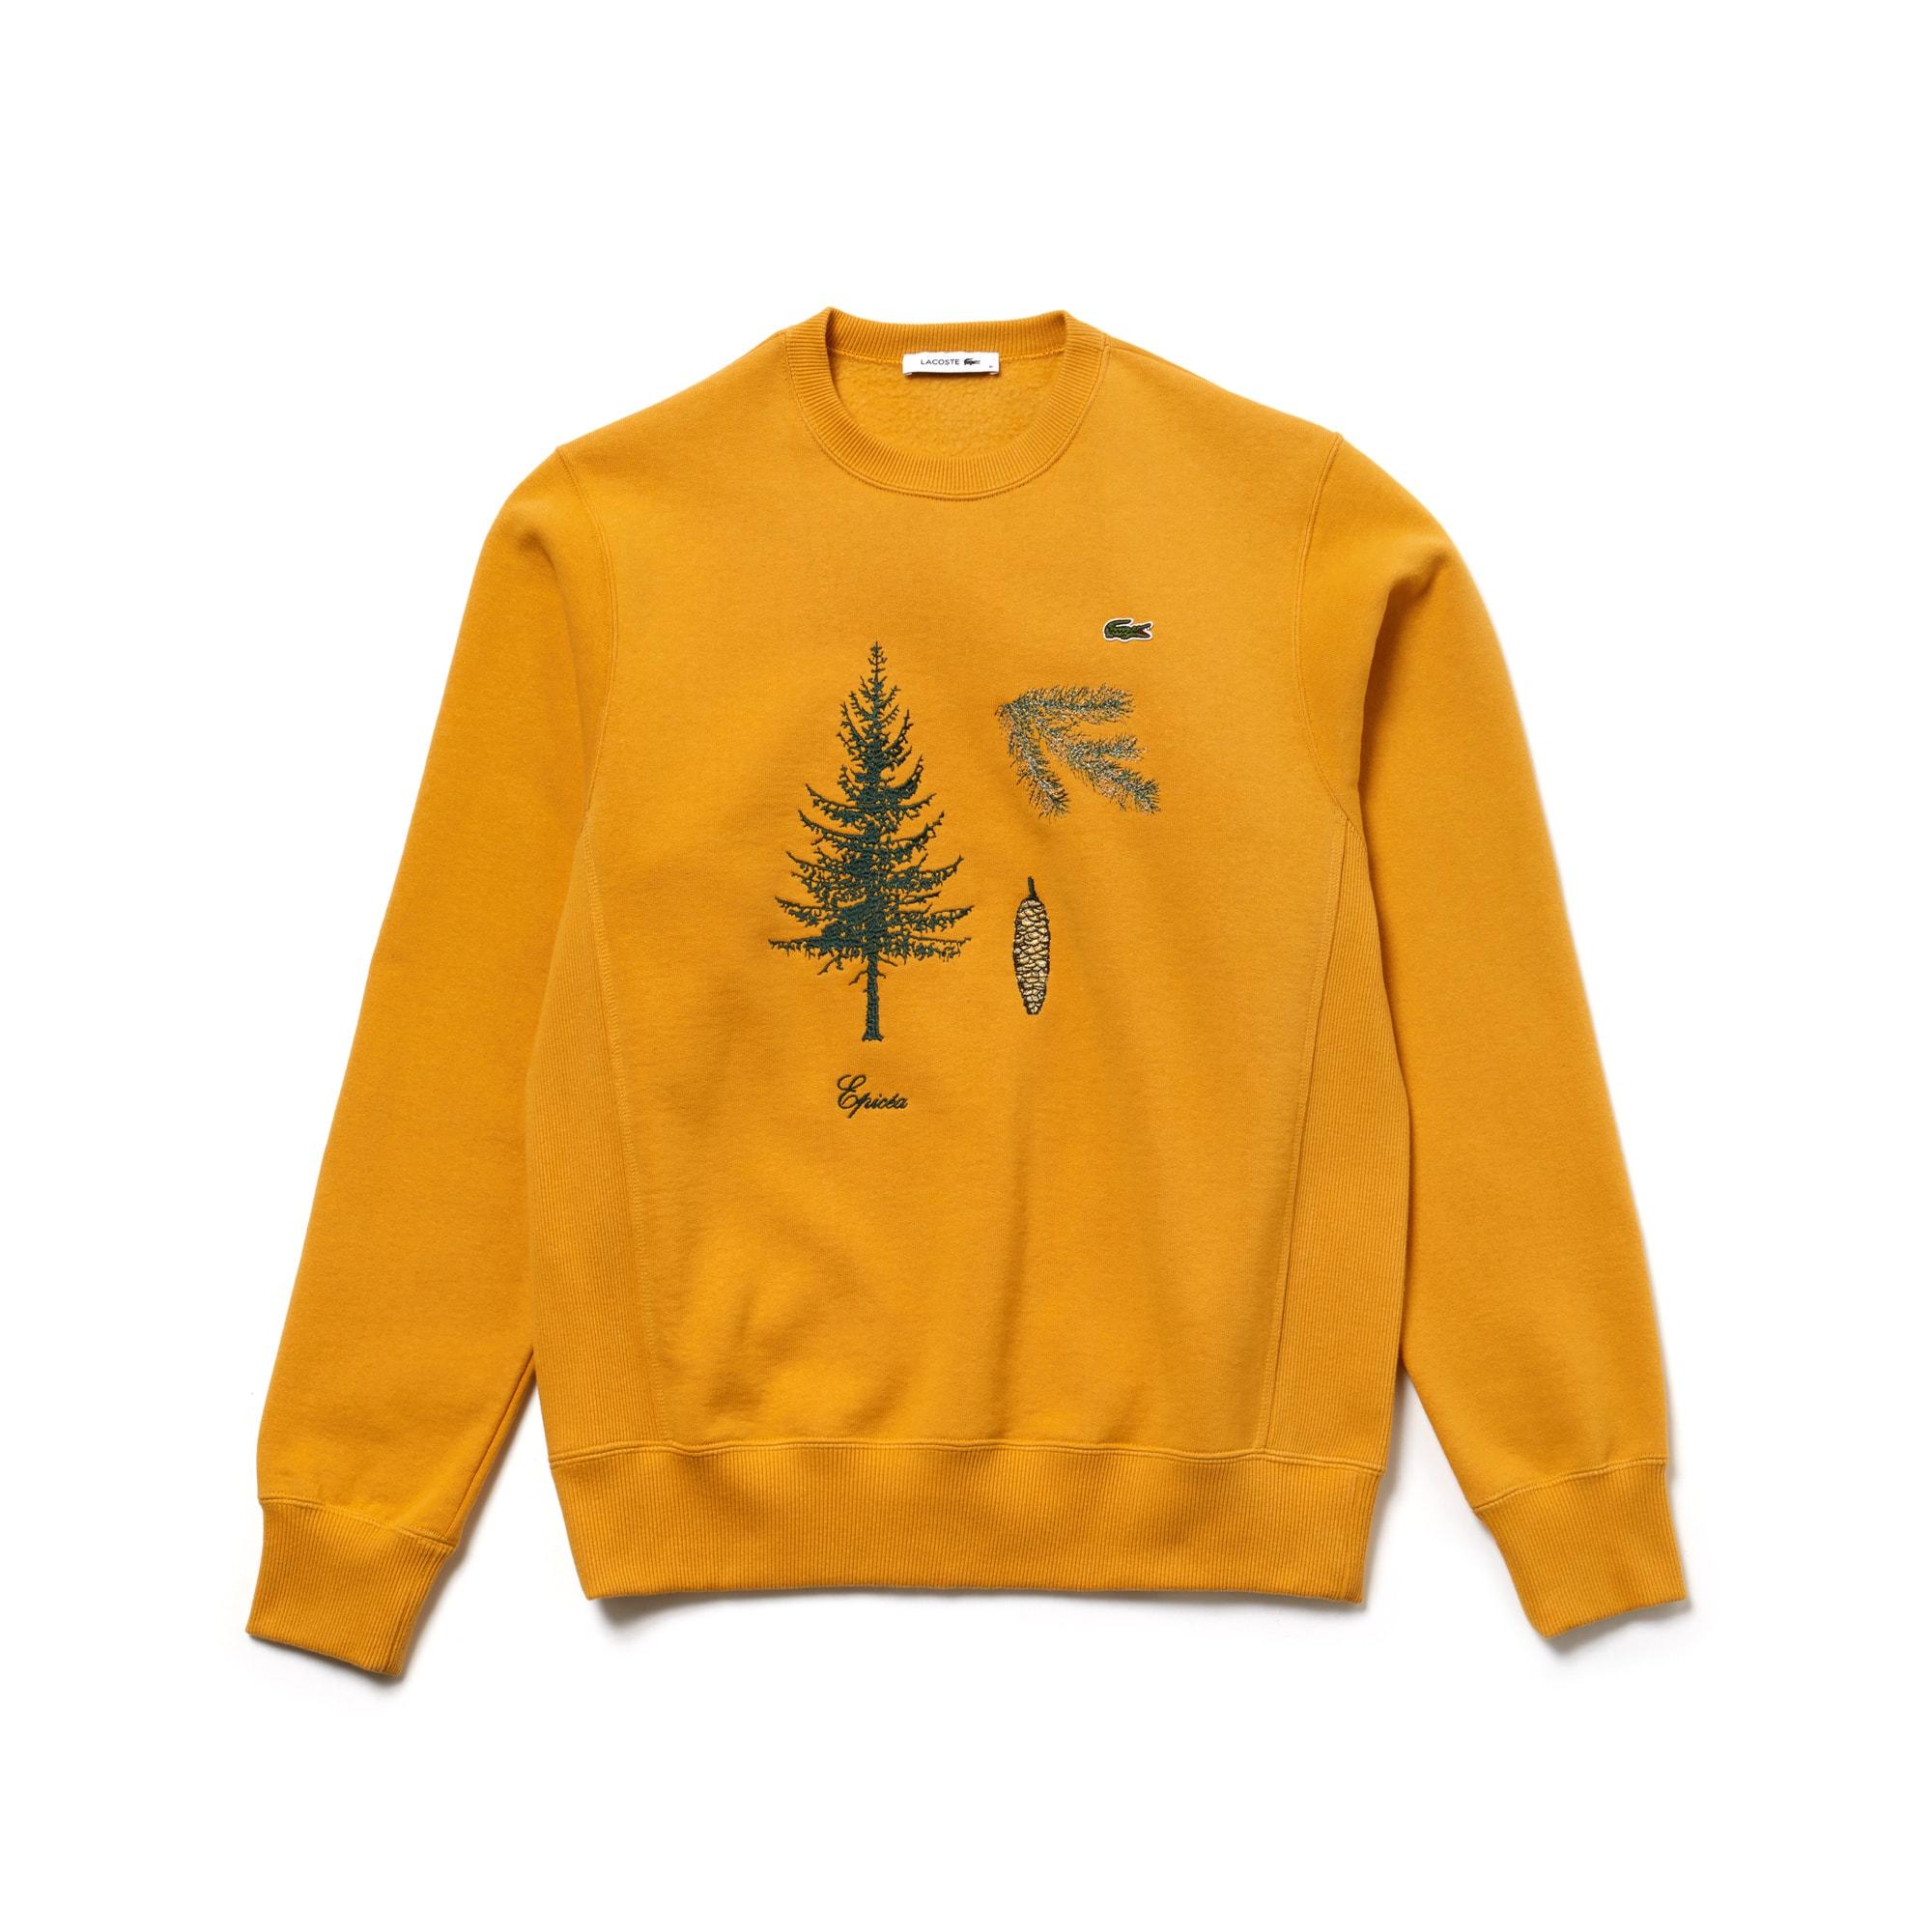 Unisex Fashion Show Embroidered Fleece Sweatshirt